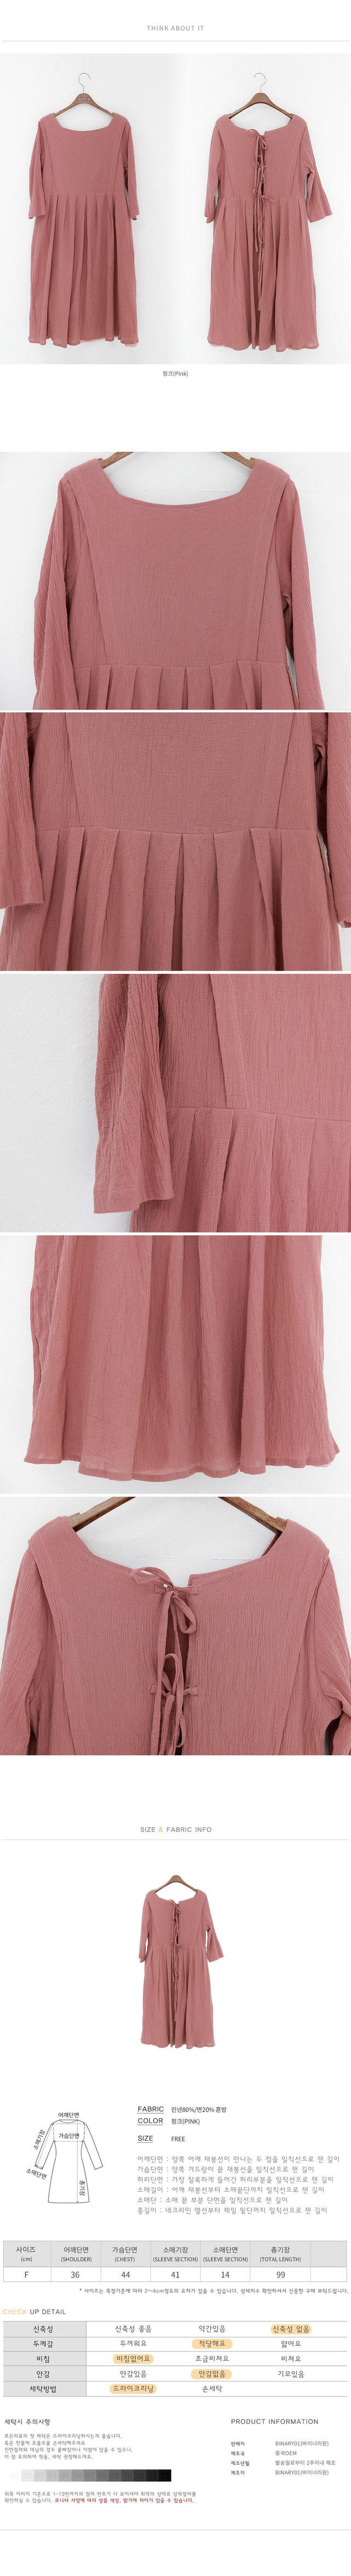 Linen pink carat square dress